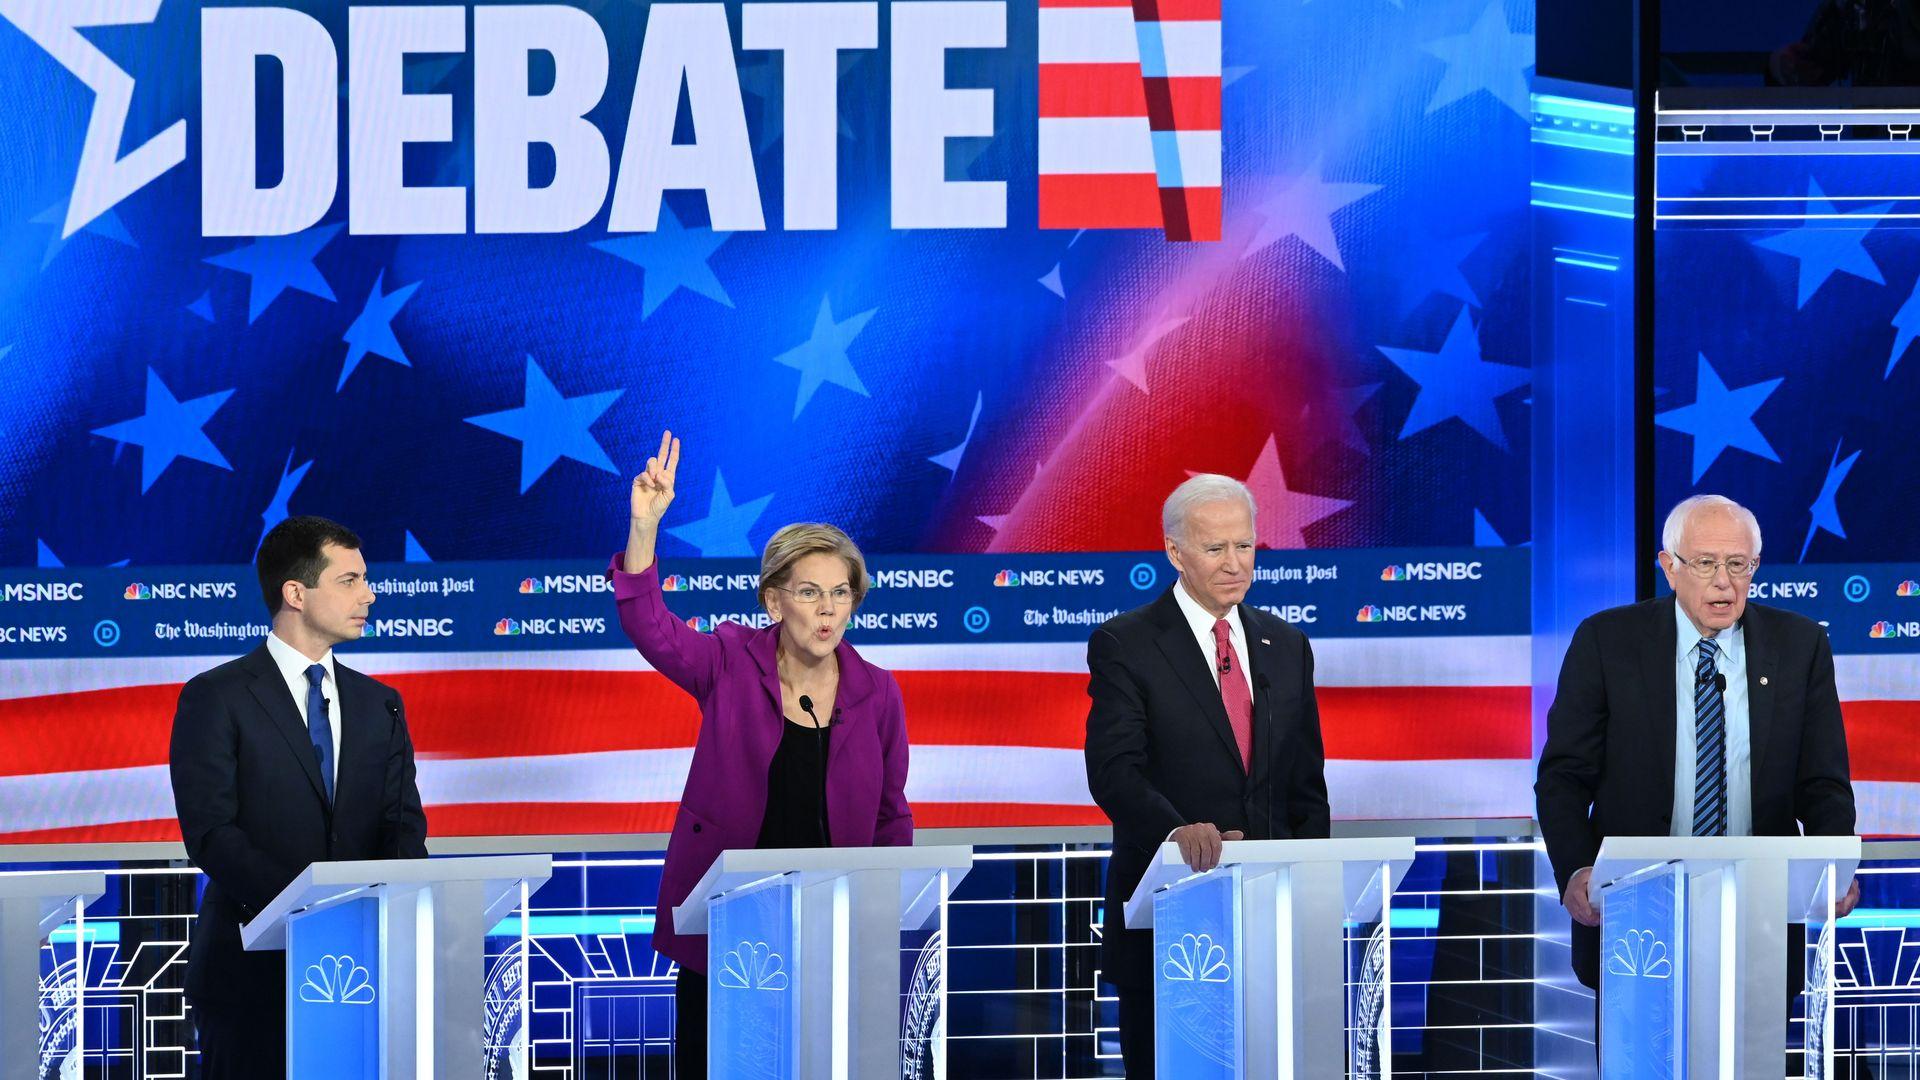 5 takeaways from the fifth Democratic debate